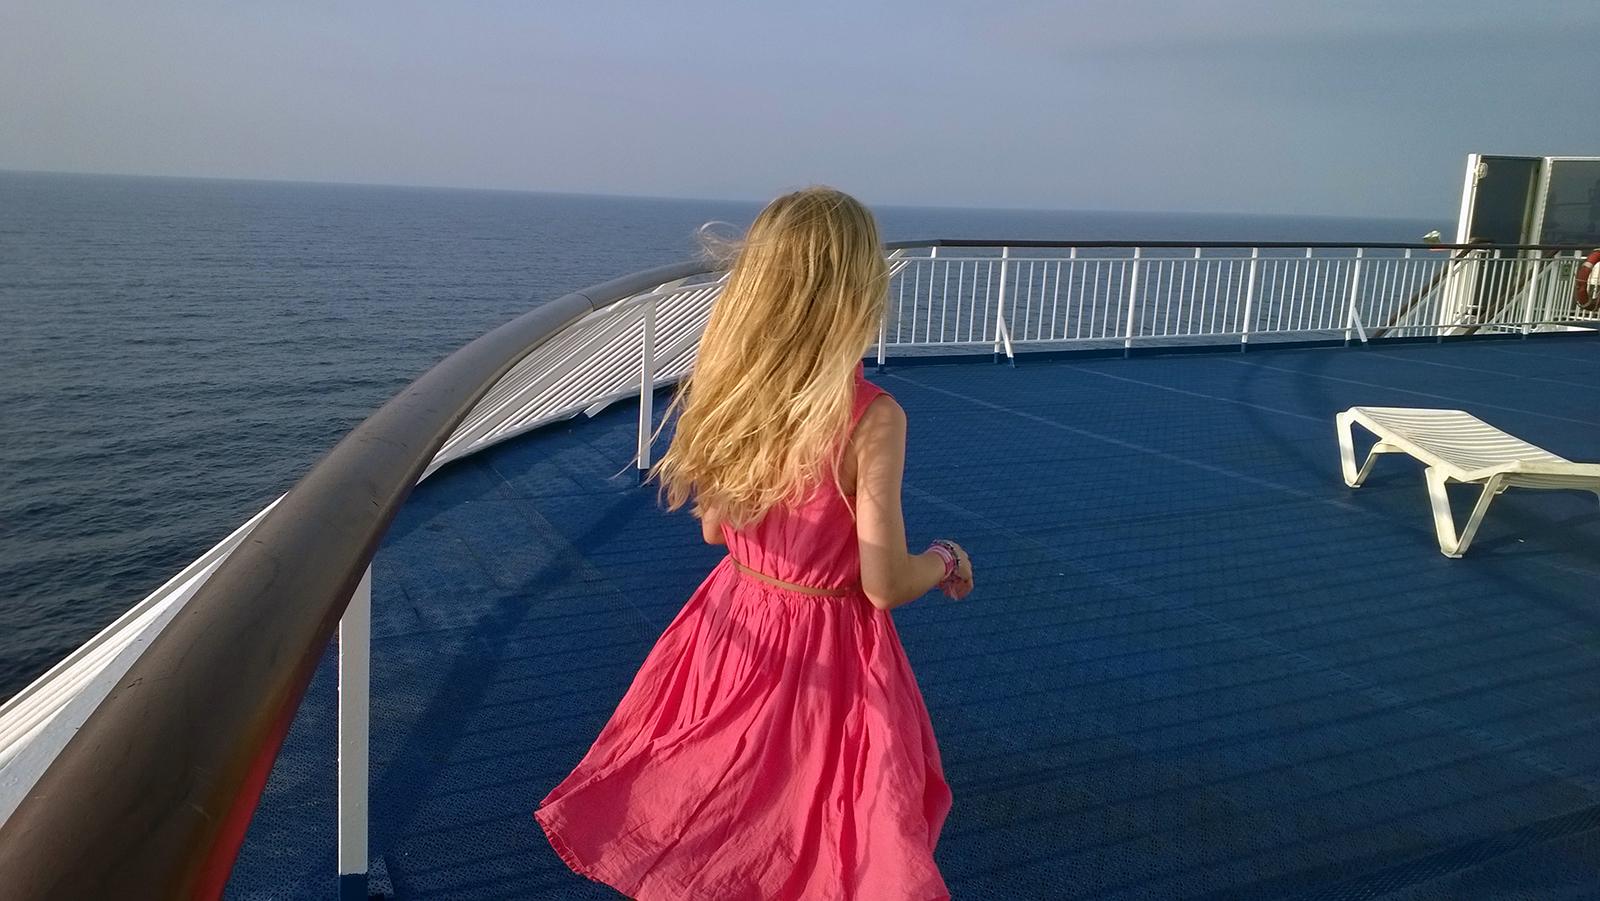 On the ferry to Majorca, circa 2013